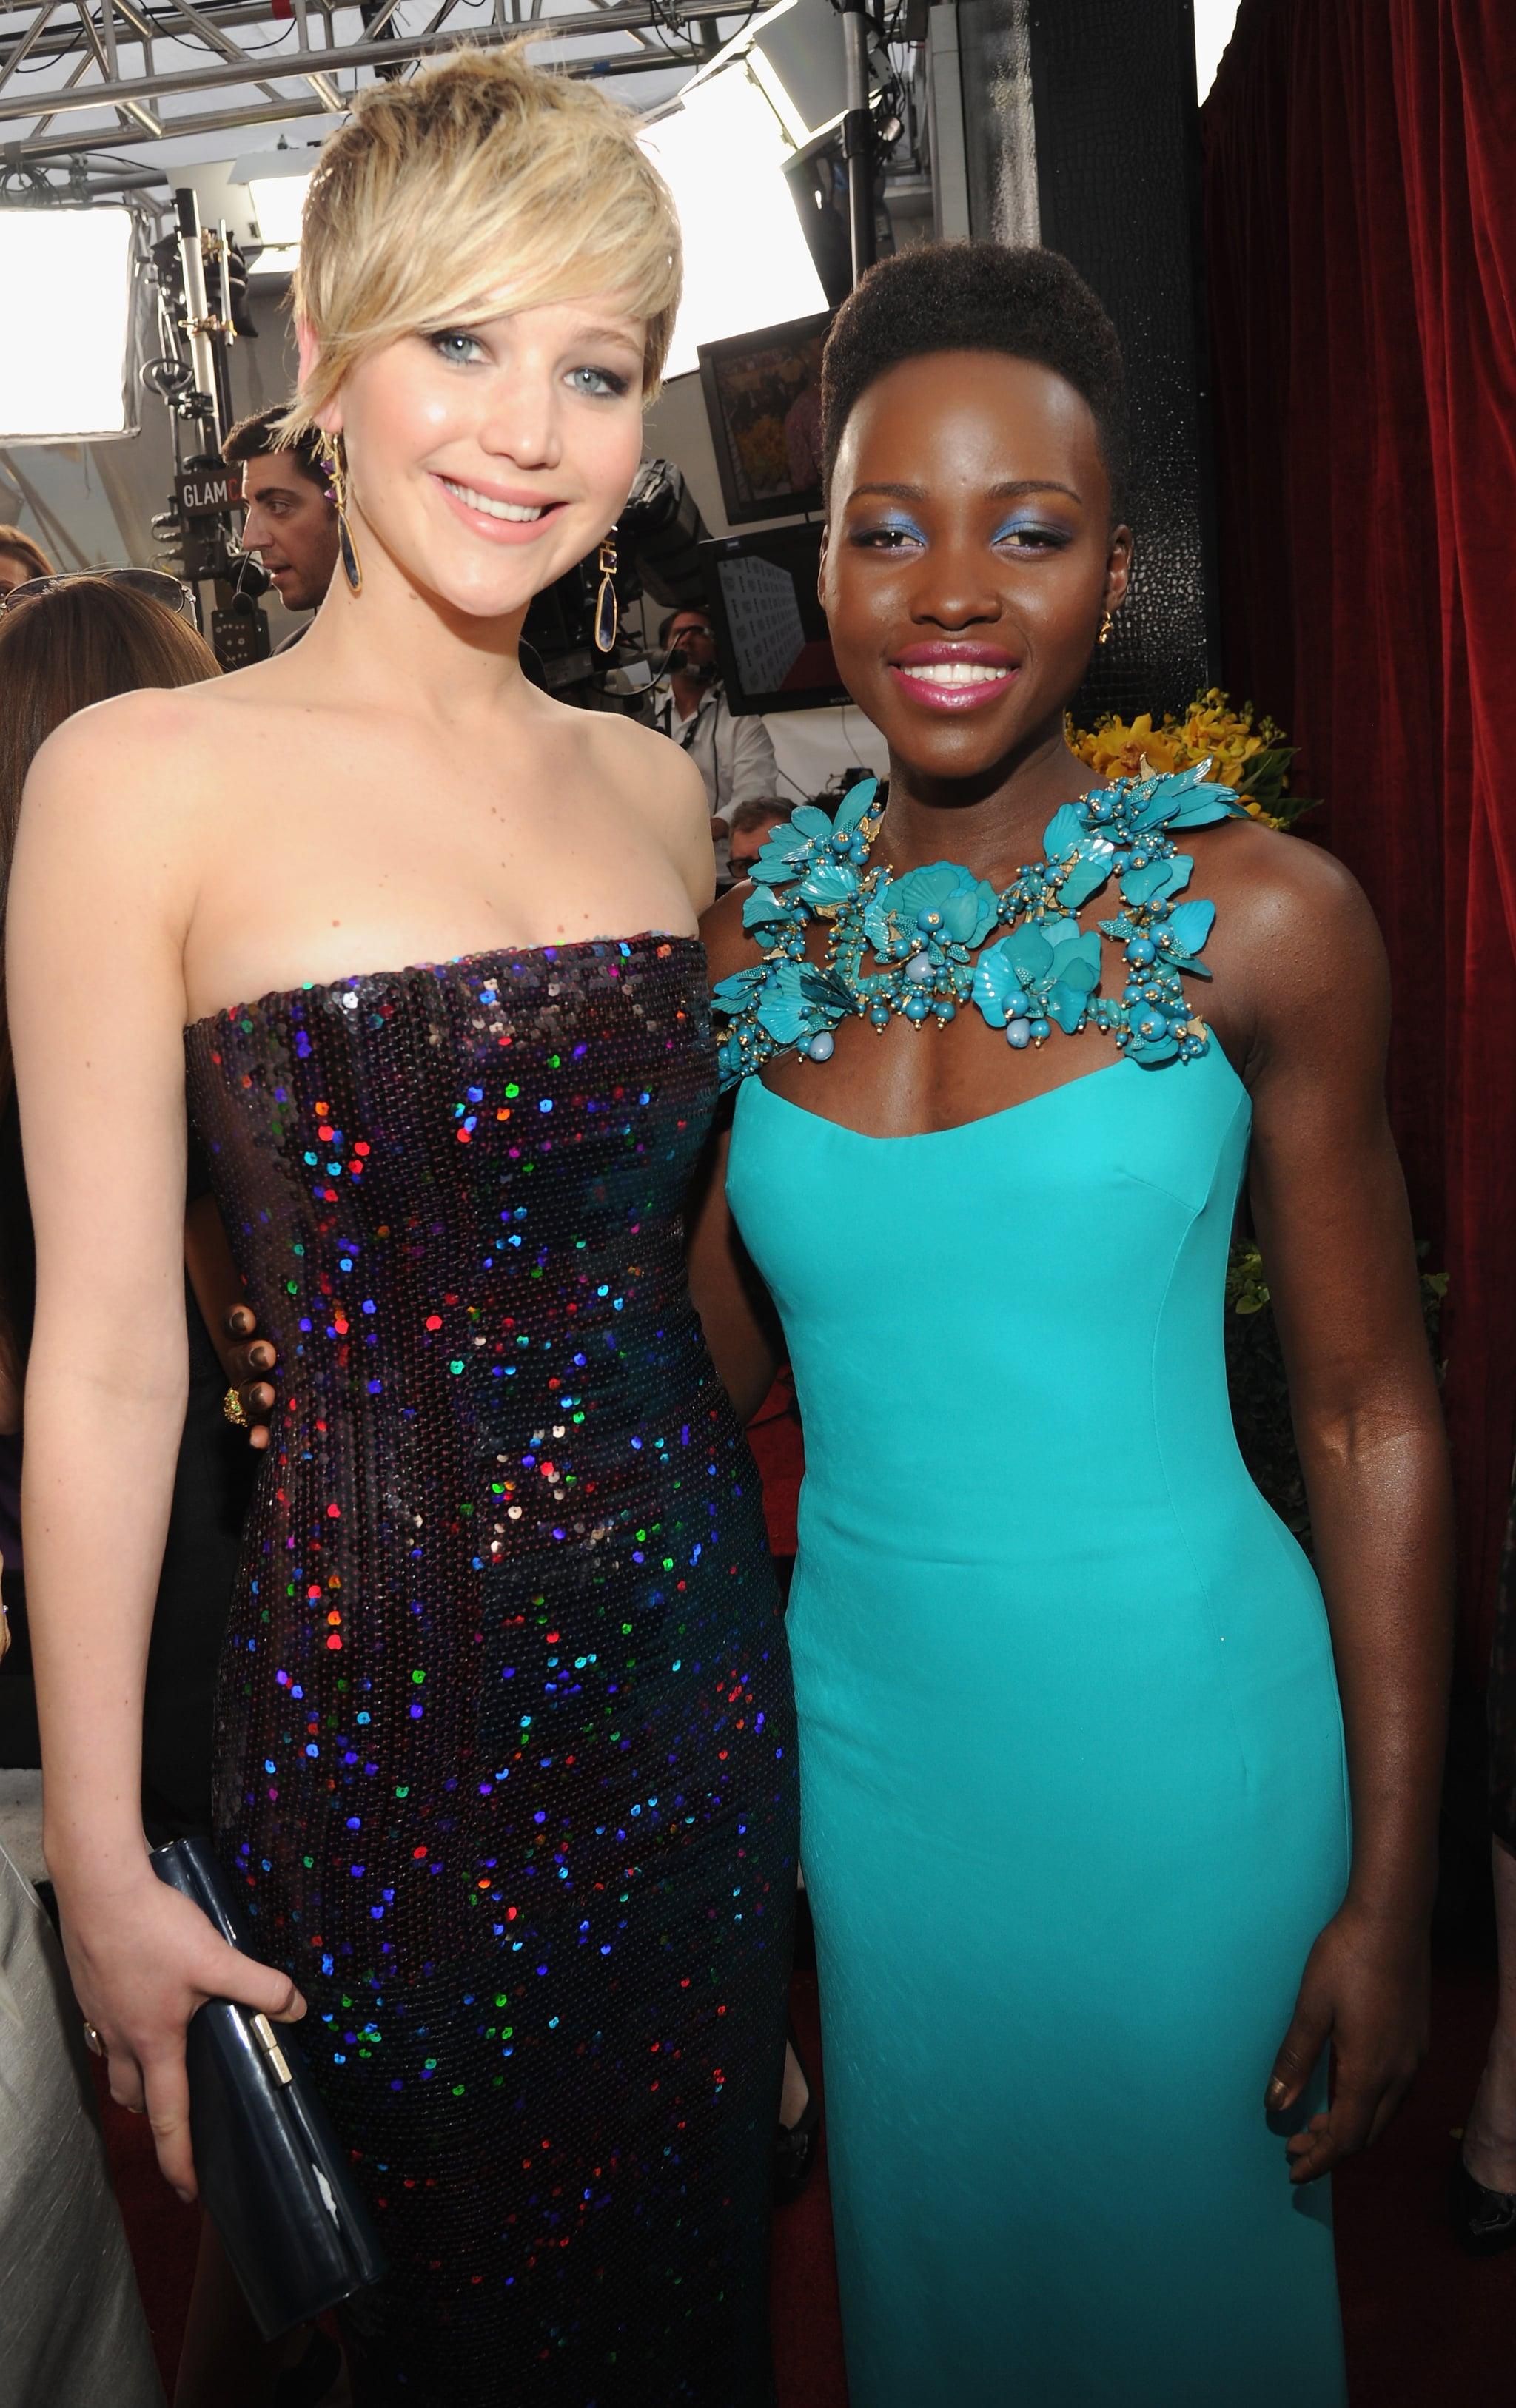 Jennifer Lawrence and Lupita Nyong'o made a gorgeous pair.